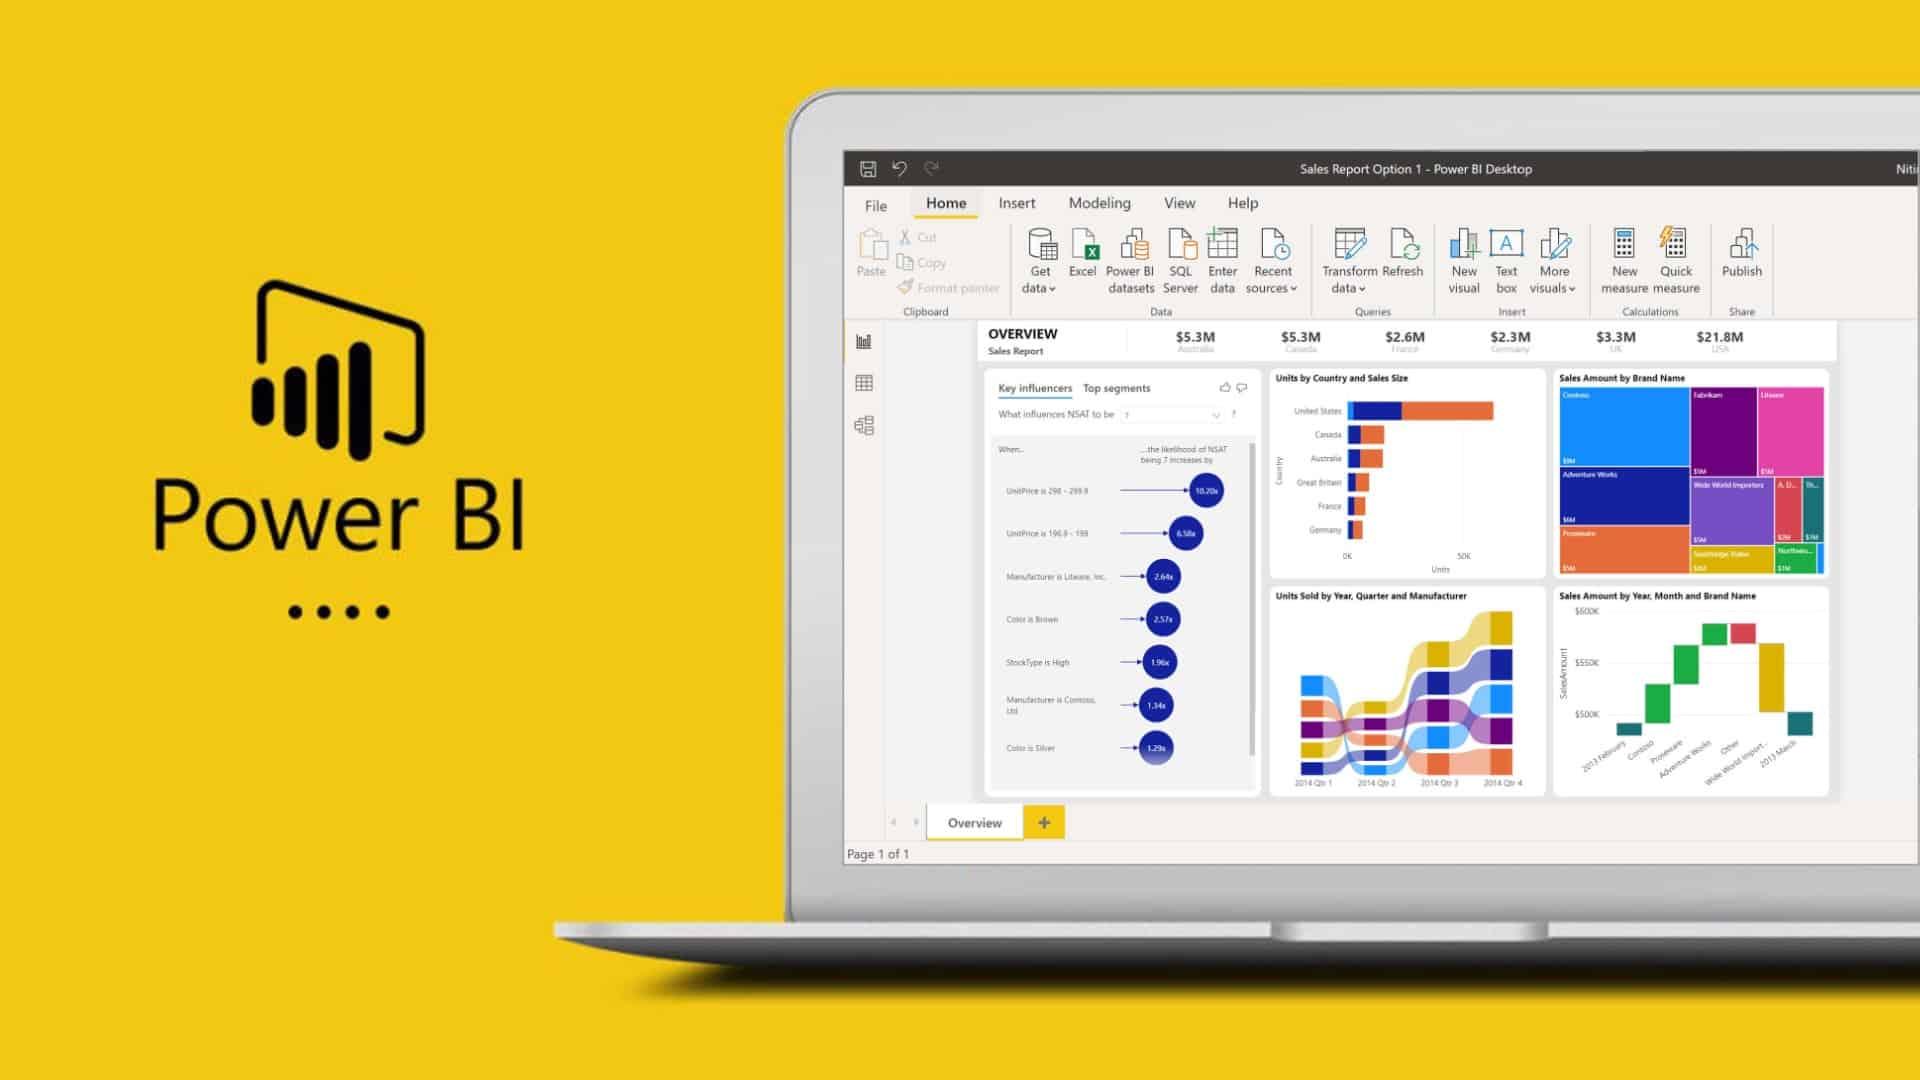 Power BI เครื่องมือเข้าถึง Insight in Data ที่นักการตลาดยุคดาต้า 5.0 ต้องใช้เป็น